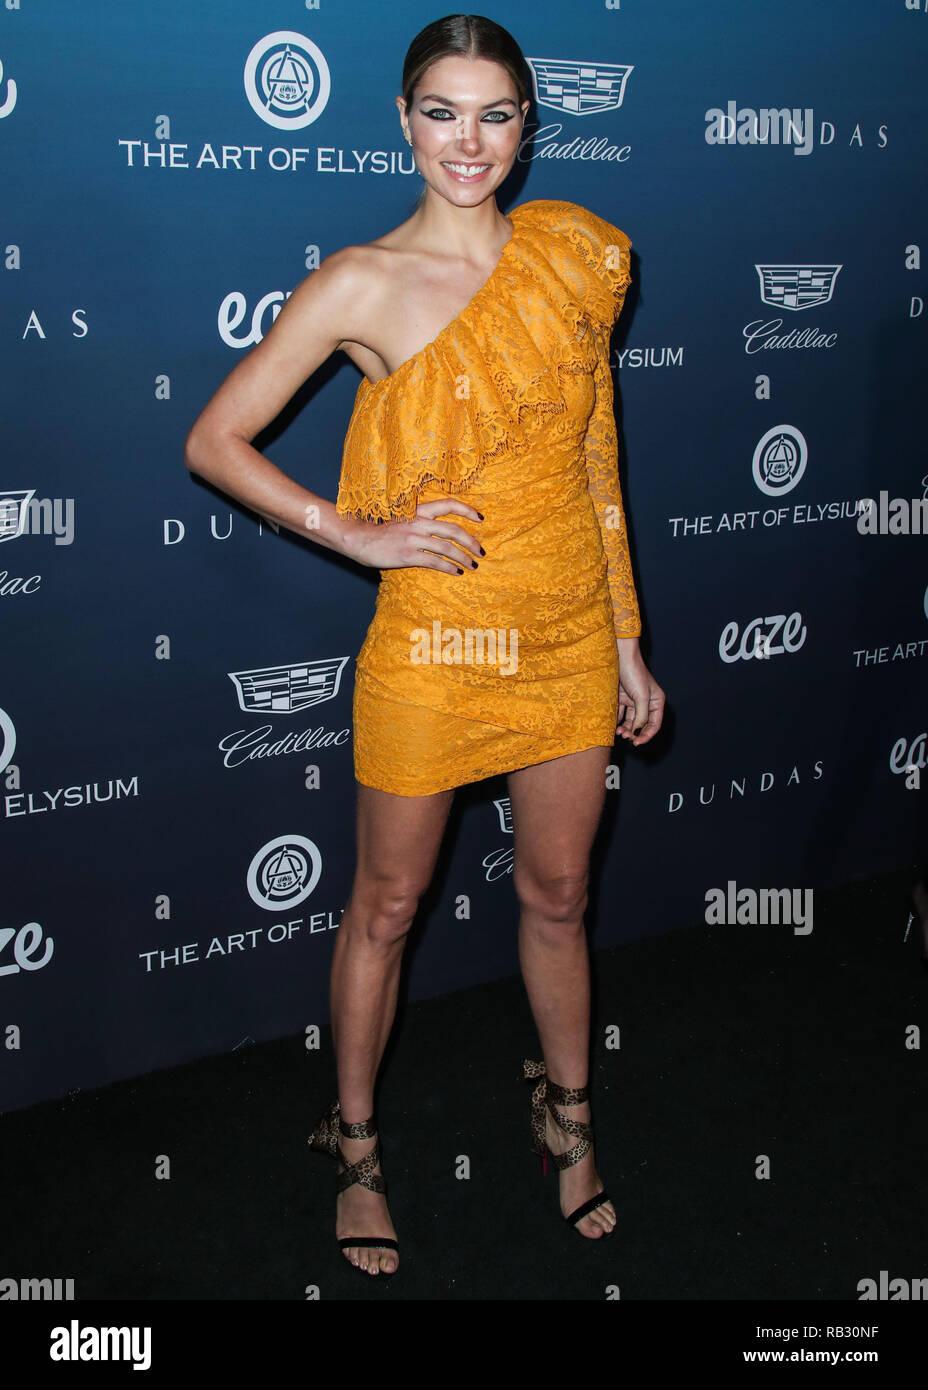 2019 Jessica Hart nudes (38 photos), Ass, Hot, Feet, in bikini 2020